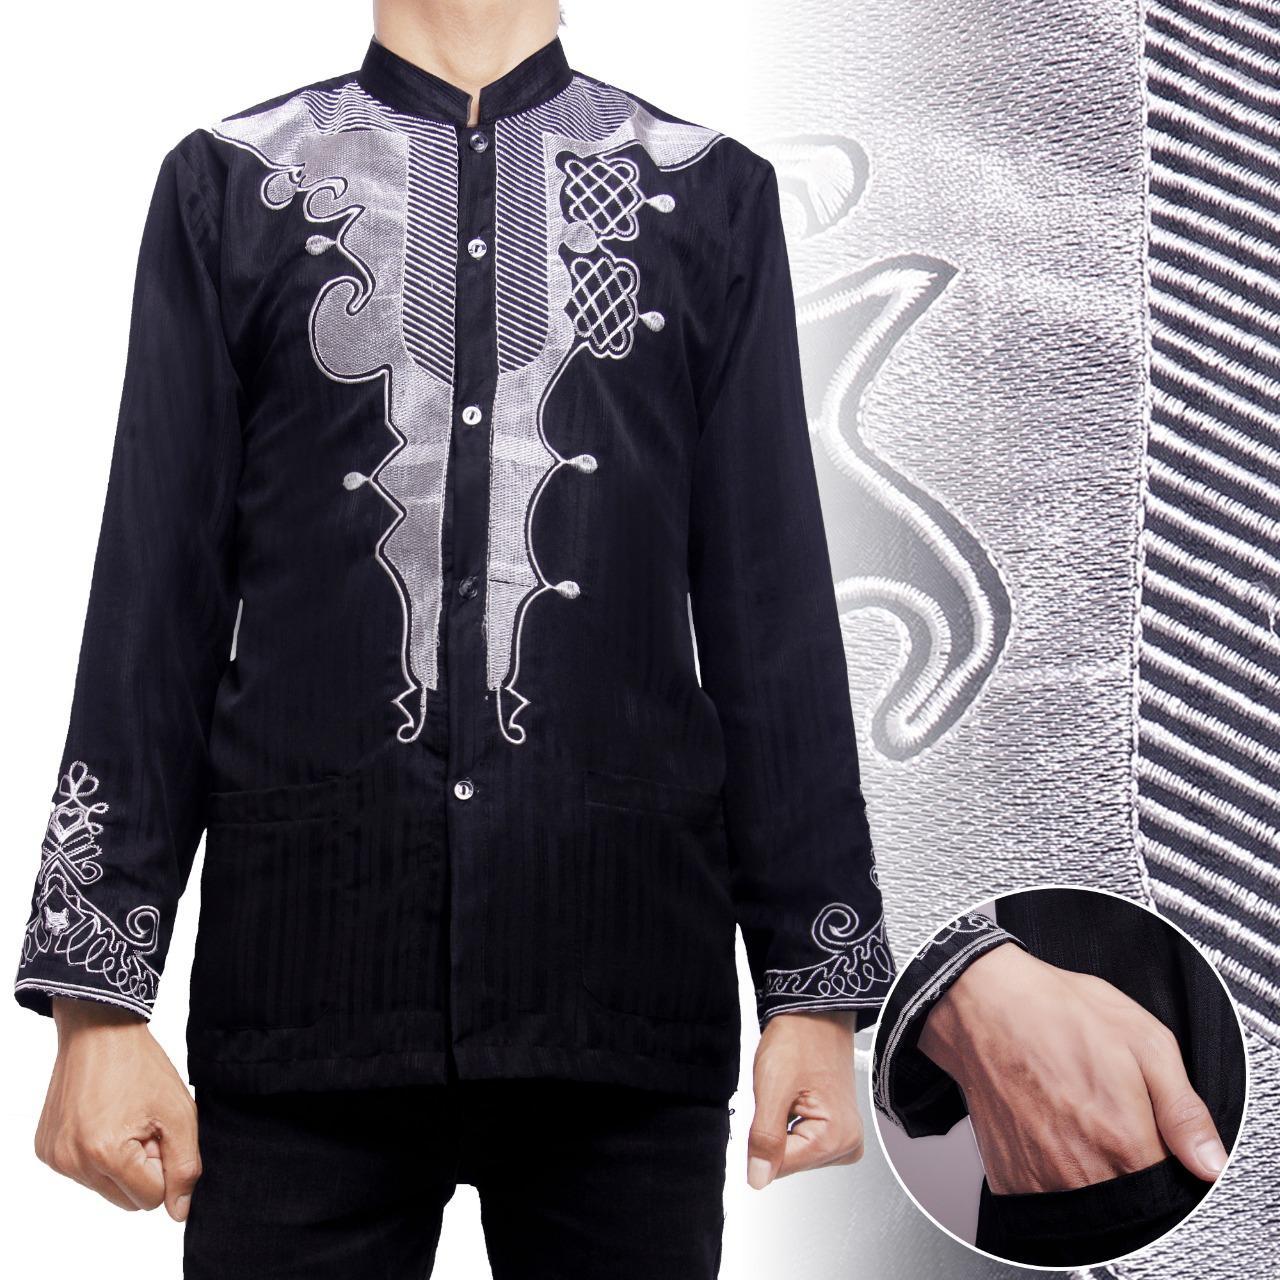 SB Collection Atasan Kemeja Koko Black Panther Baju Muslim Batik Lengan Panjang Pria